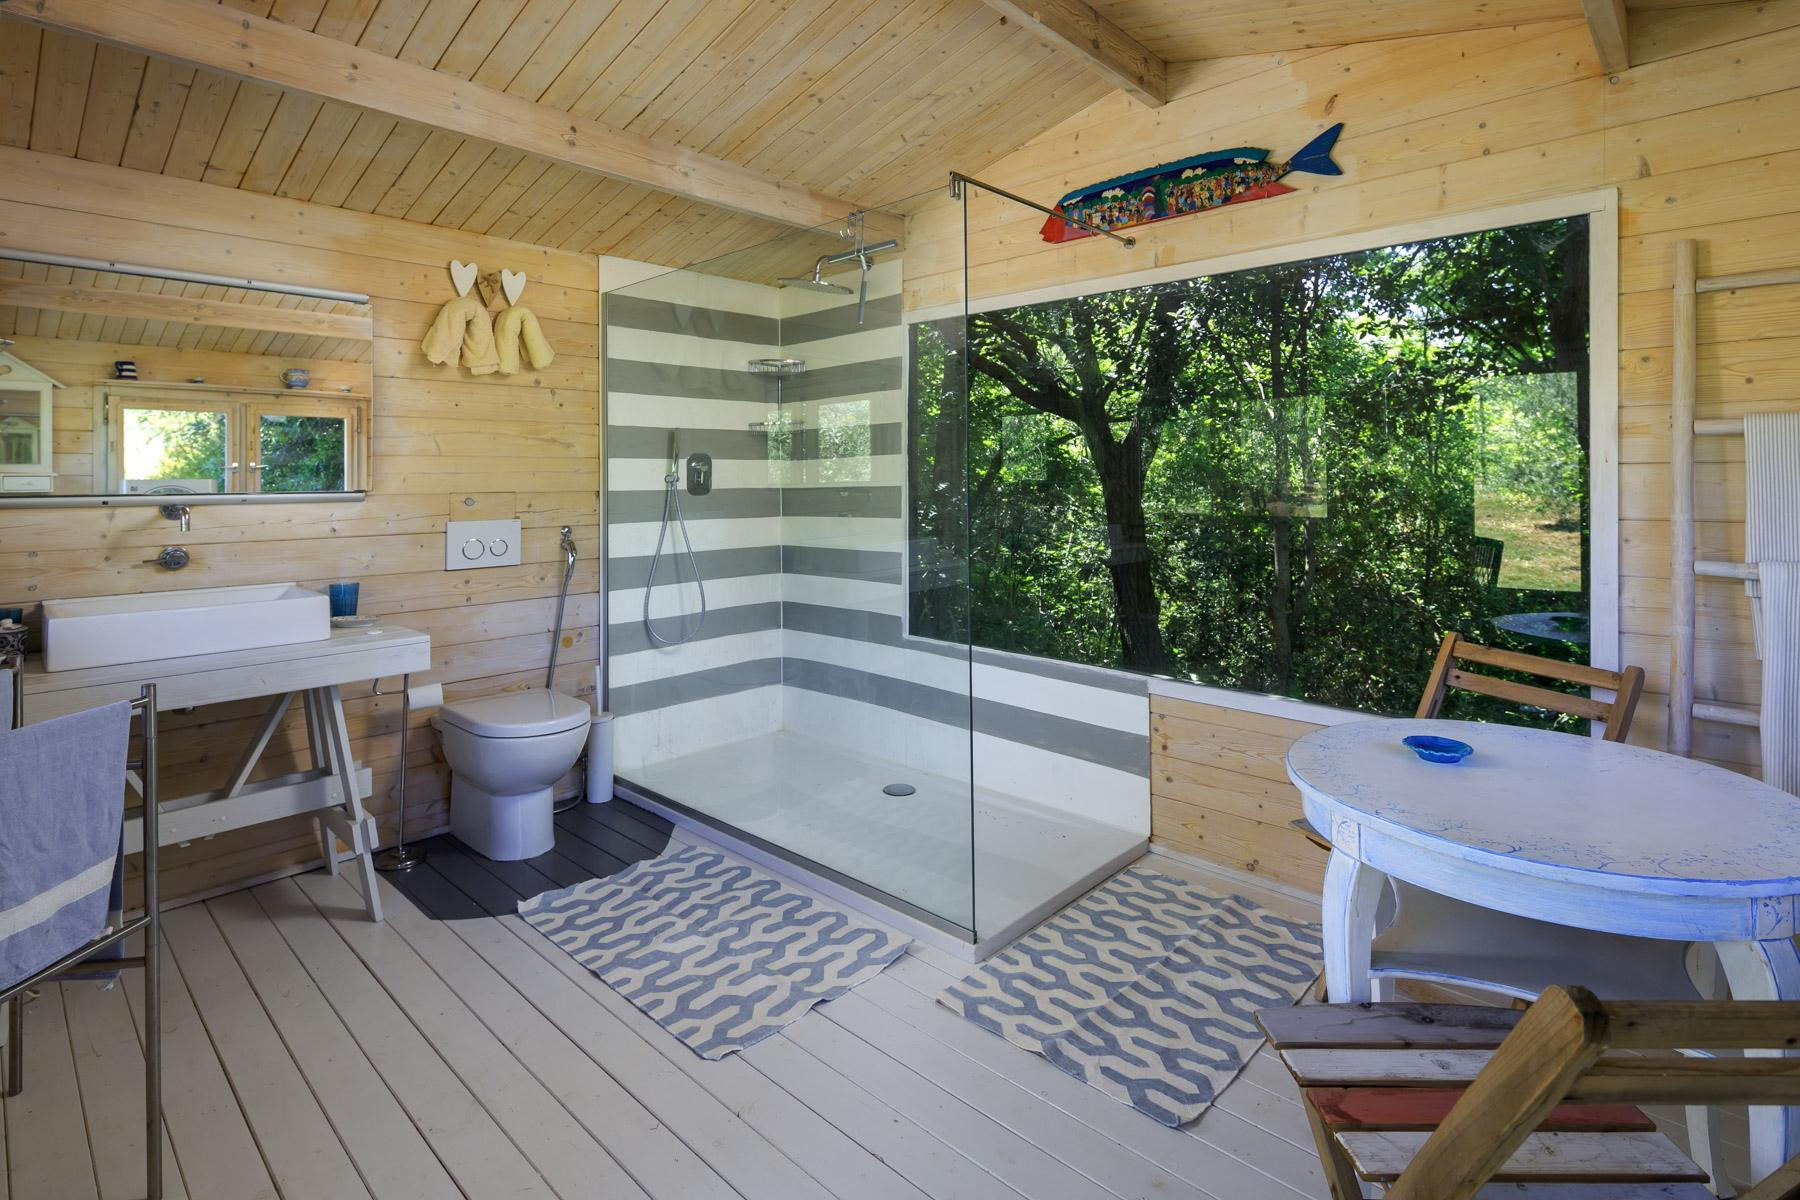 Belle villa toscane avec piscine - 16